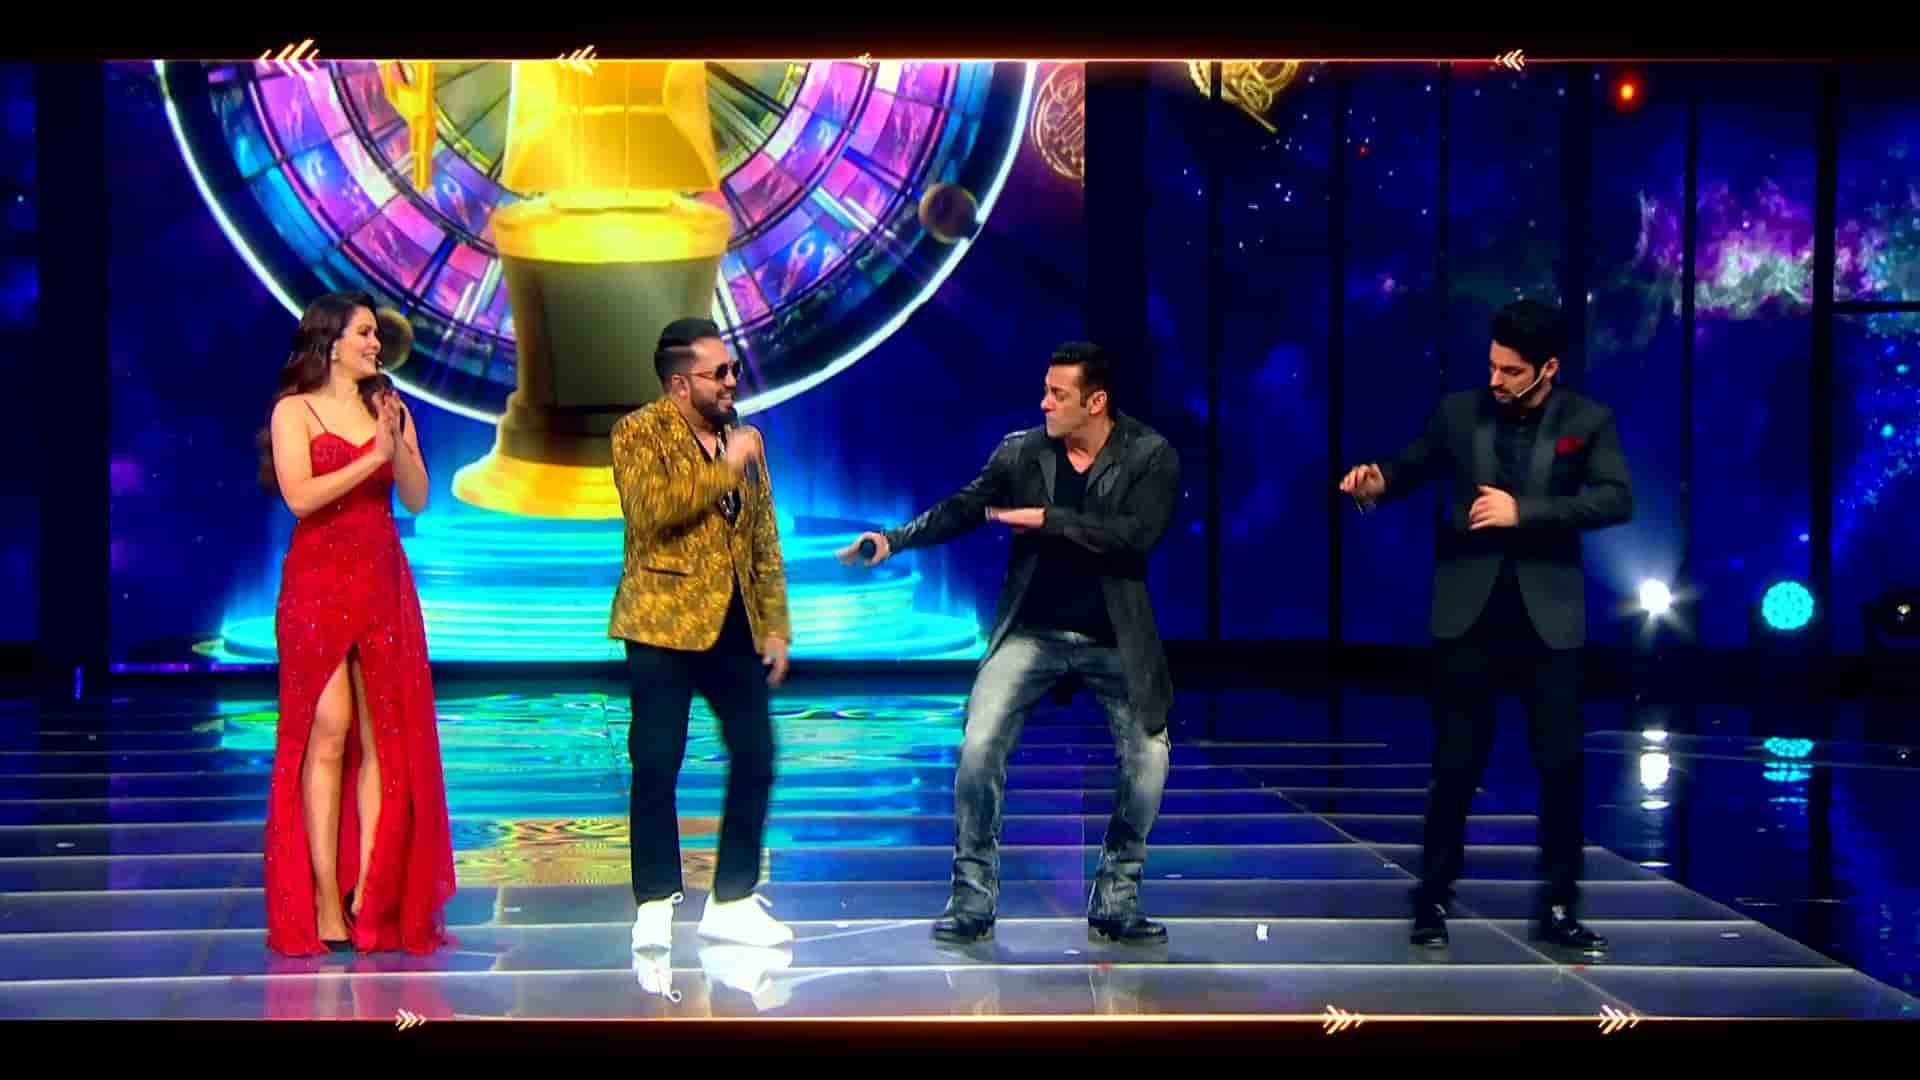 Kundali Bhagya 25 February 2021 Spoiler: Bollywood celebs prep up for Indian Pro Music League